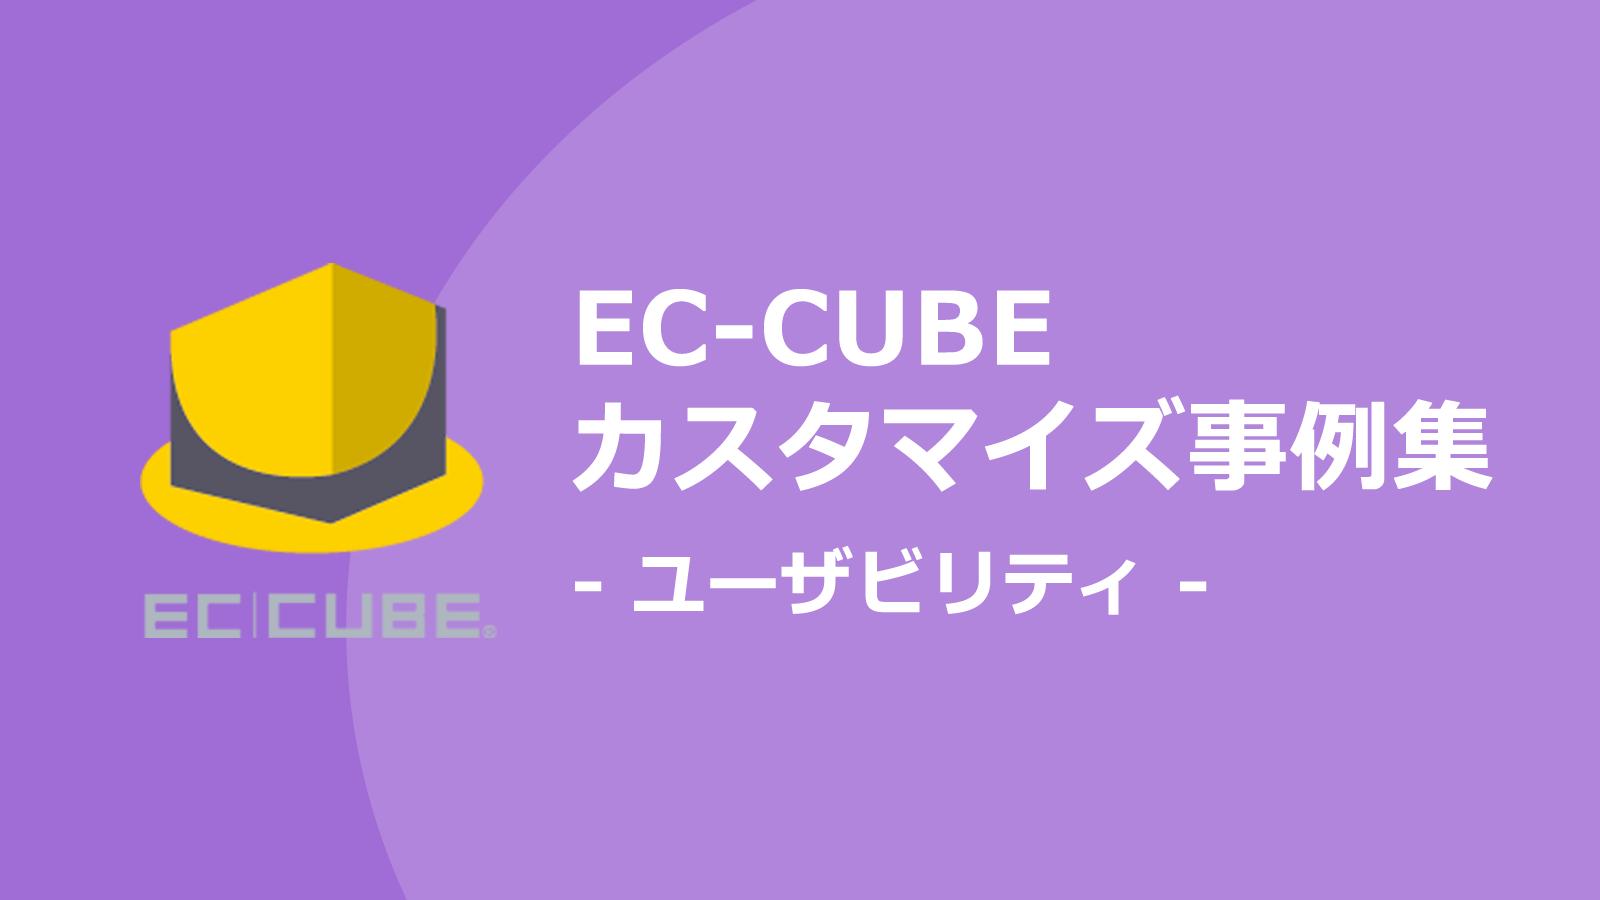 ECサイトのユーザビリティ向上することで売り上げがアップする。ユーザビリティが向上するEC-CUBEカスタマイズ事例集